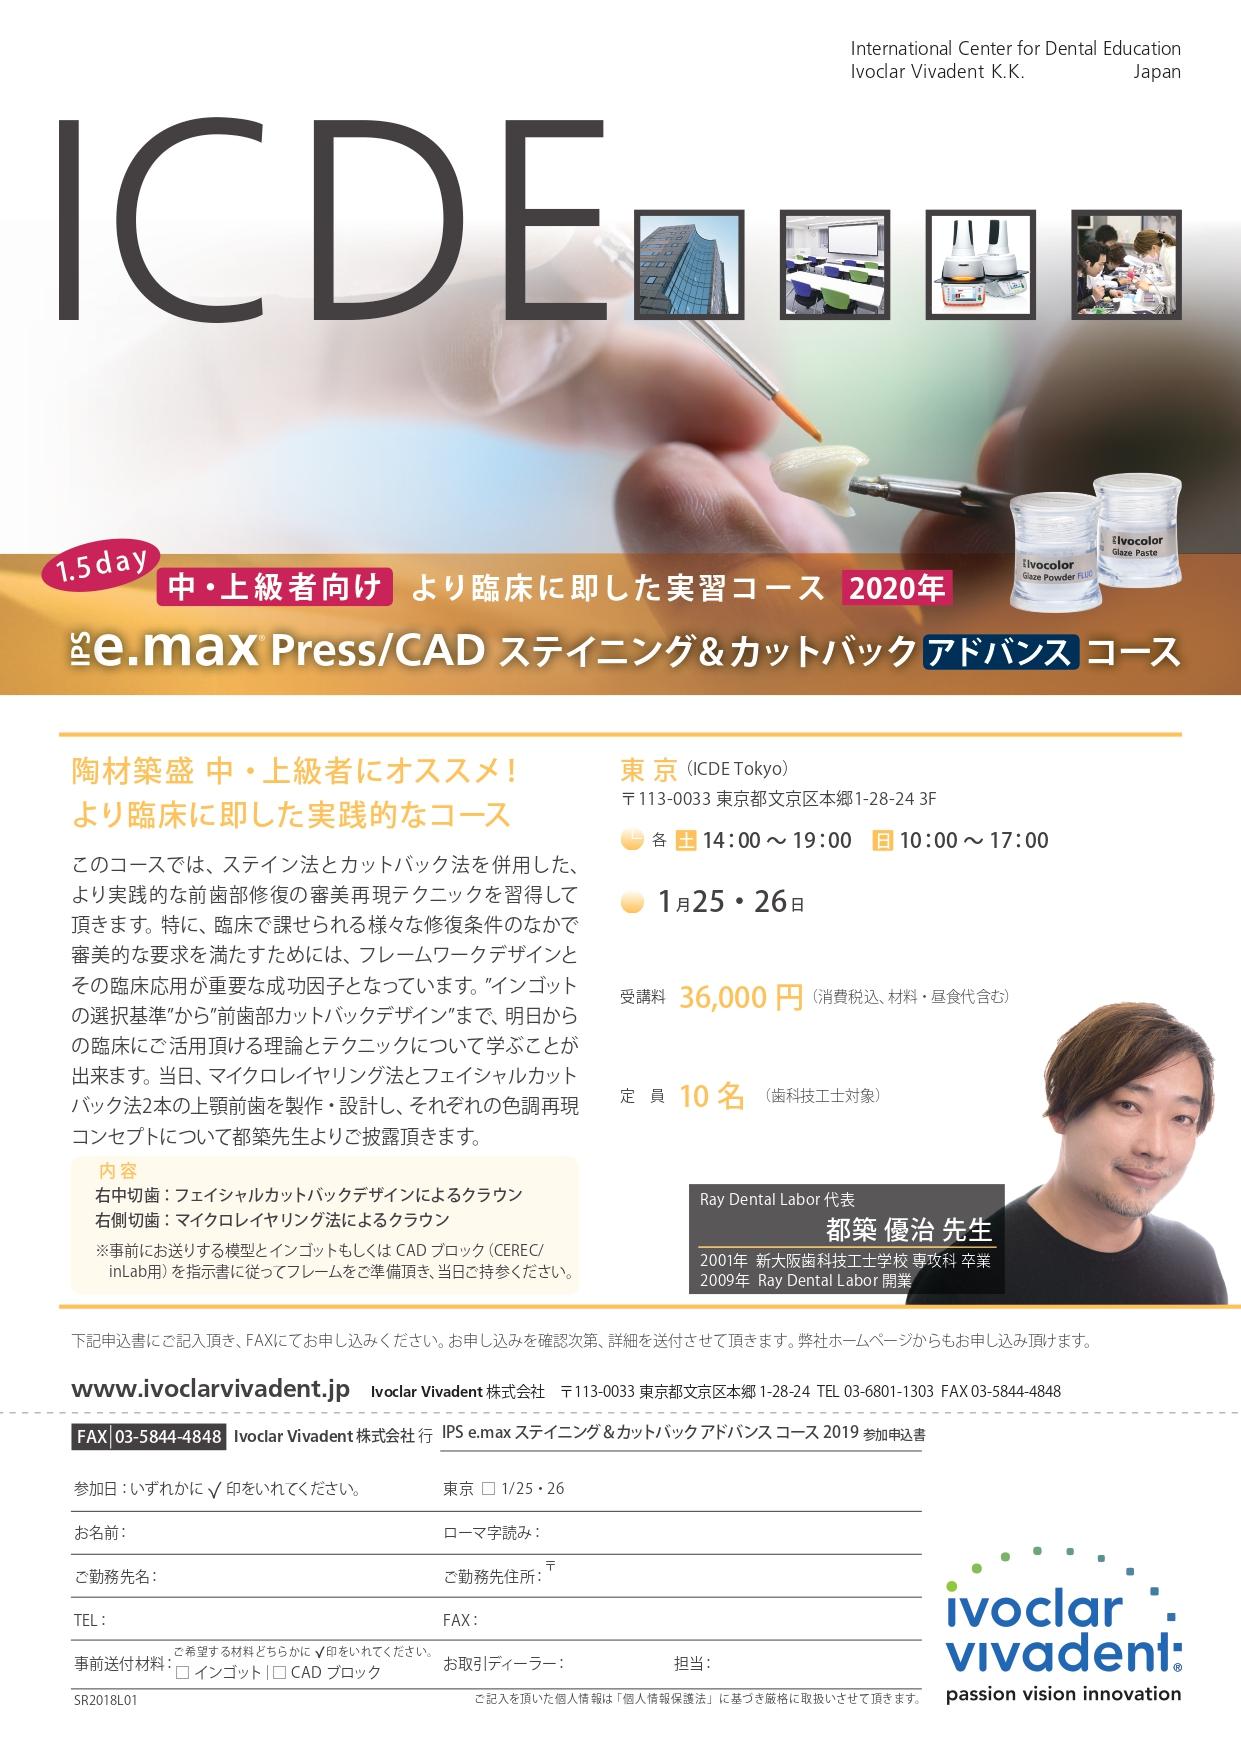 IPS e.max Press/CAD ステイニング&カットバックコース【中・上級者向け】